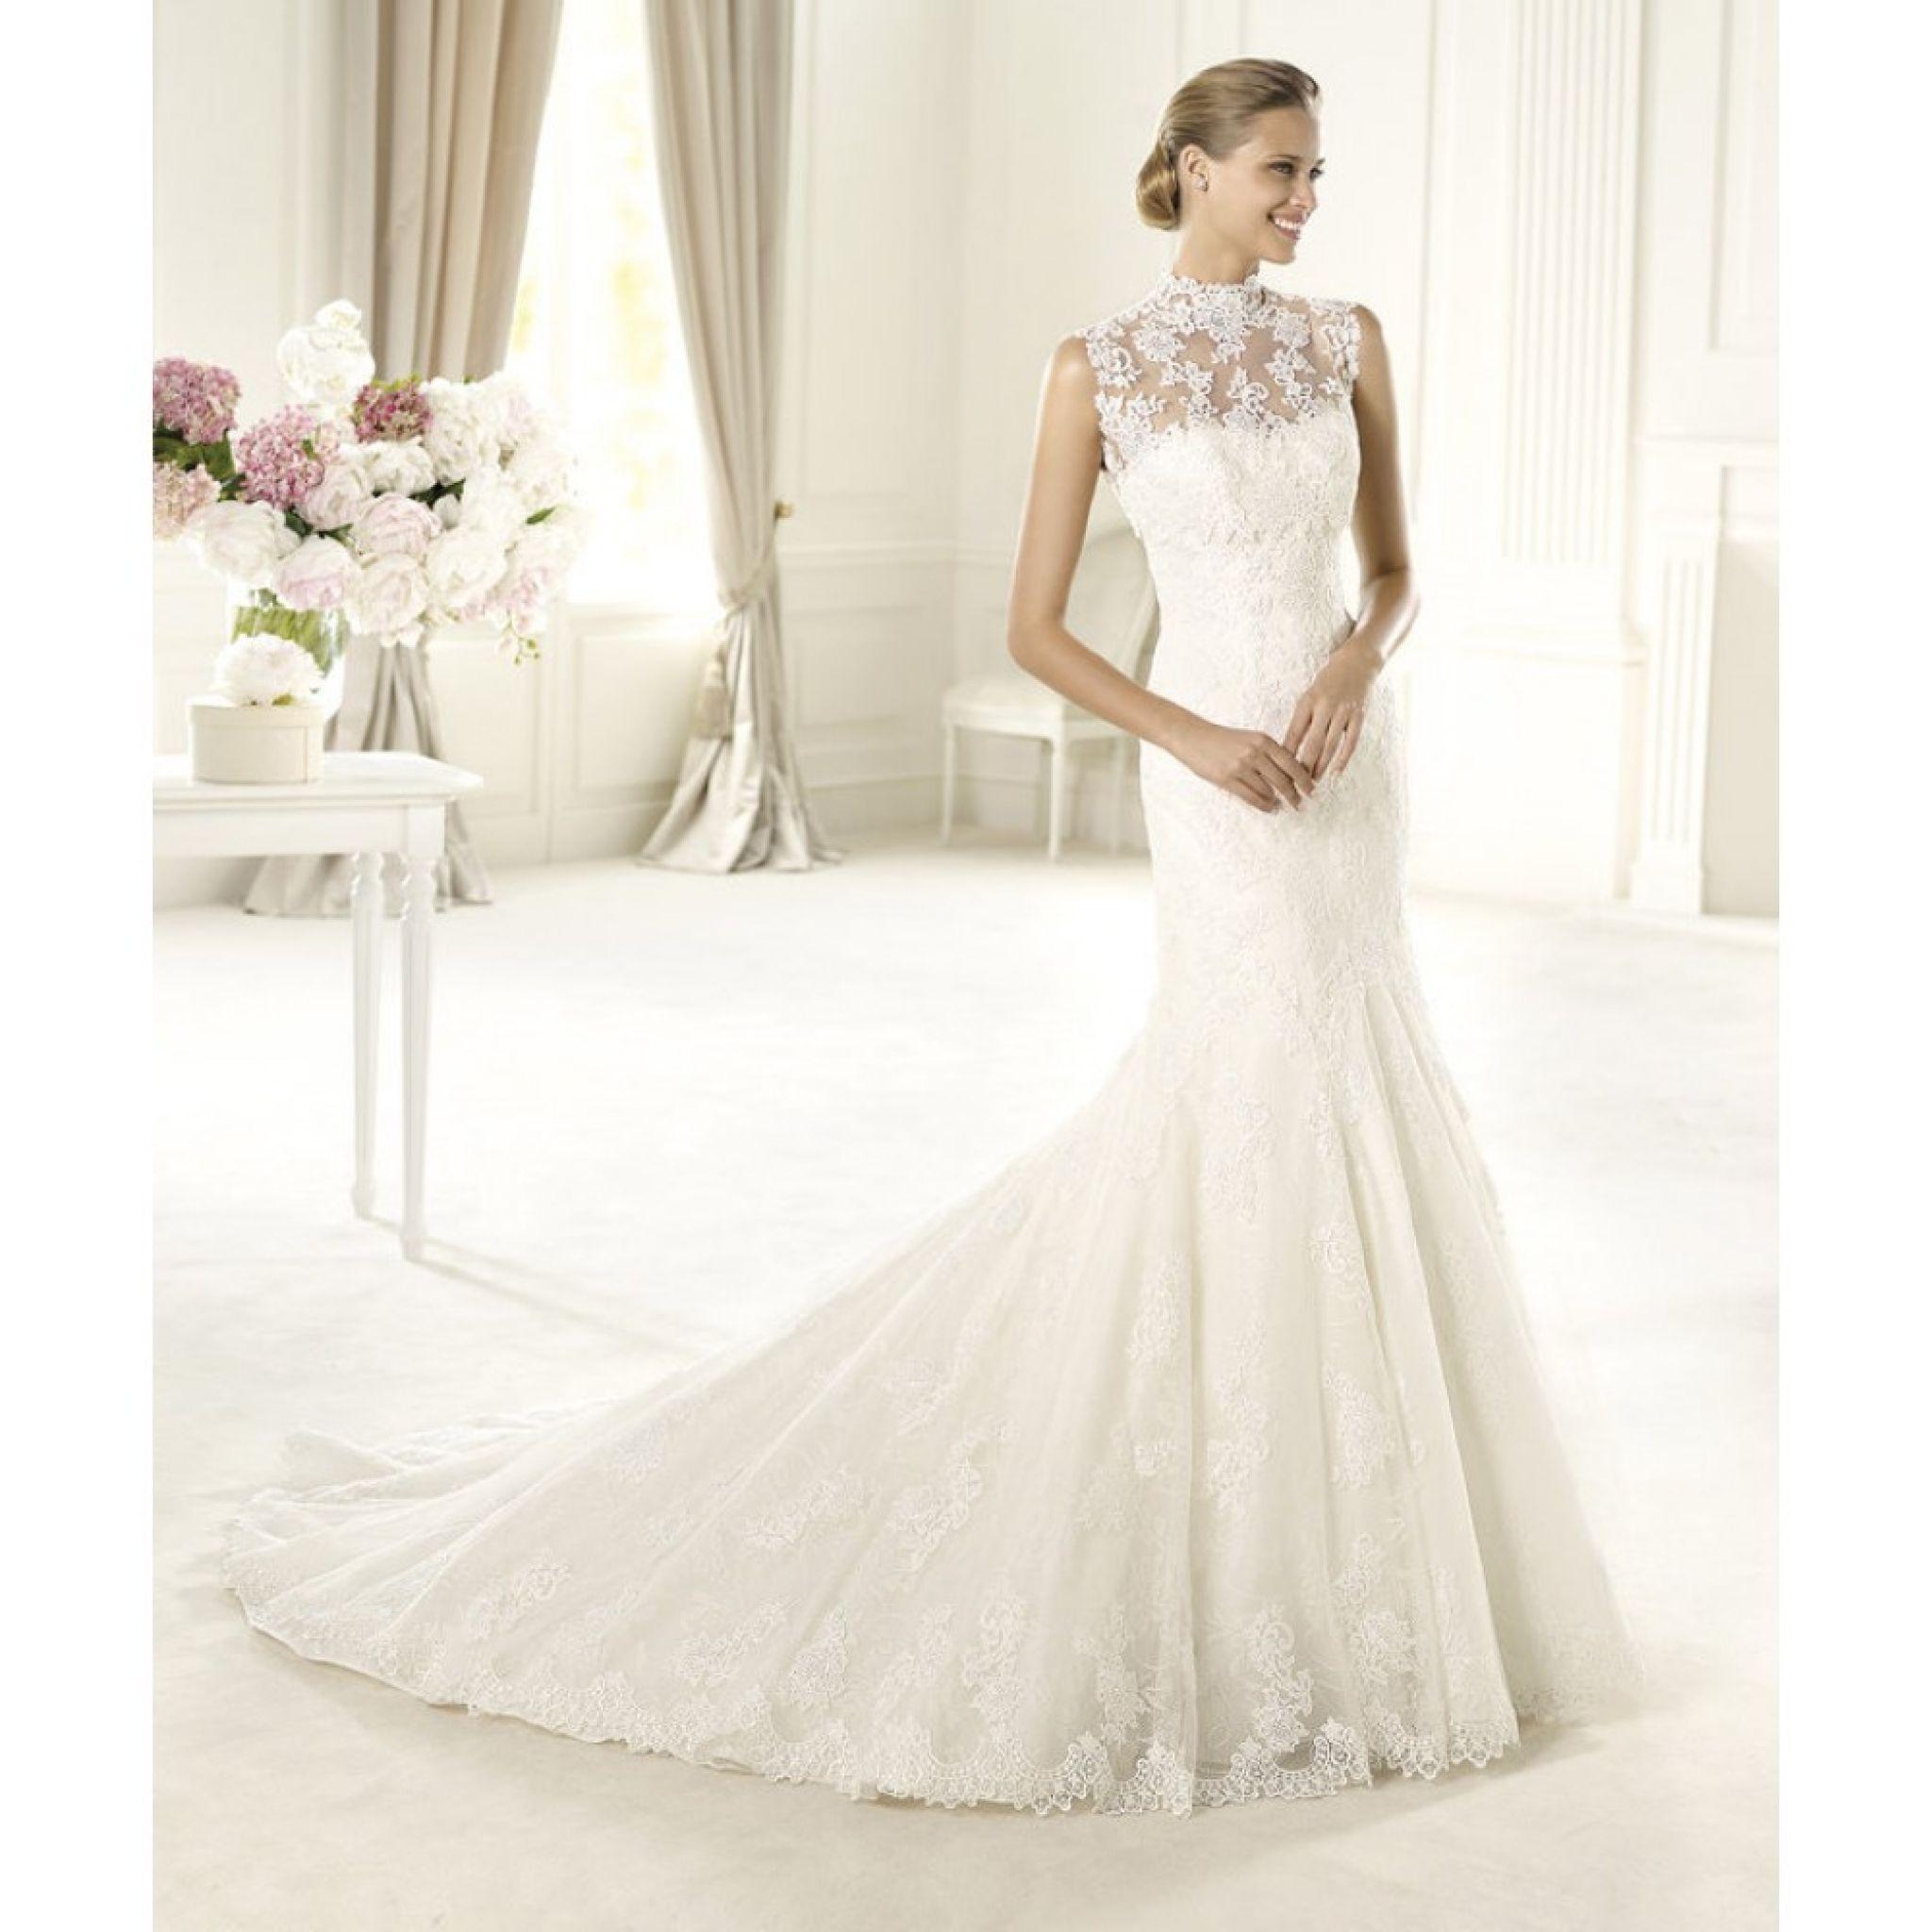 dillards wedding dresses ivory - dressy dresses for weddings Check ...